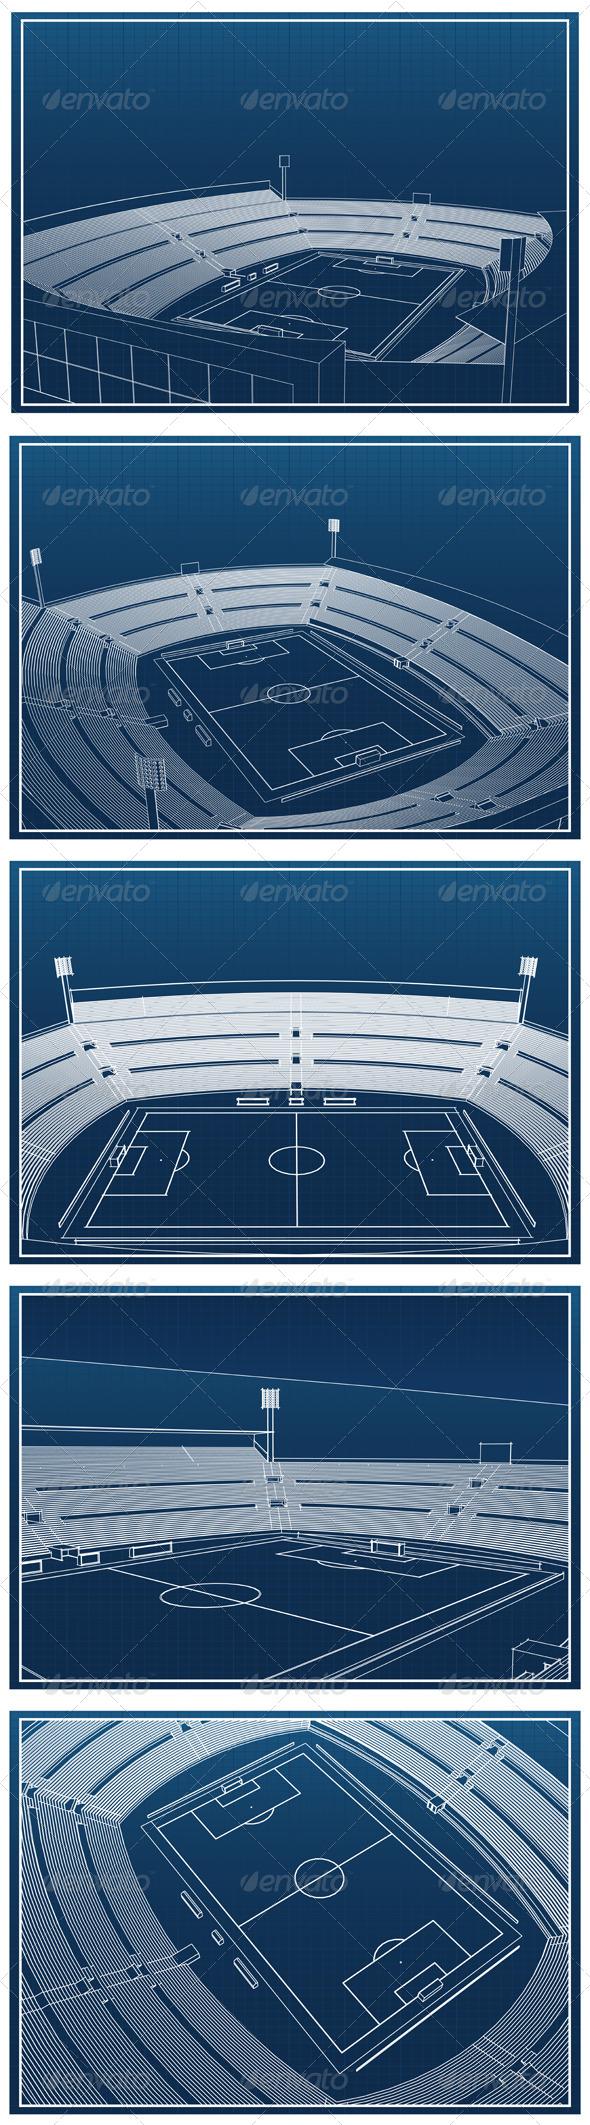 GraphicRiver Soccer Stadium Blueprints 4394765